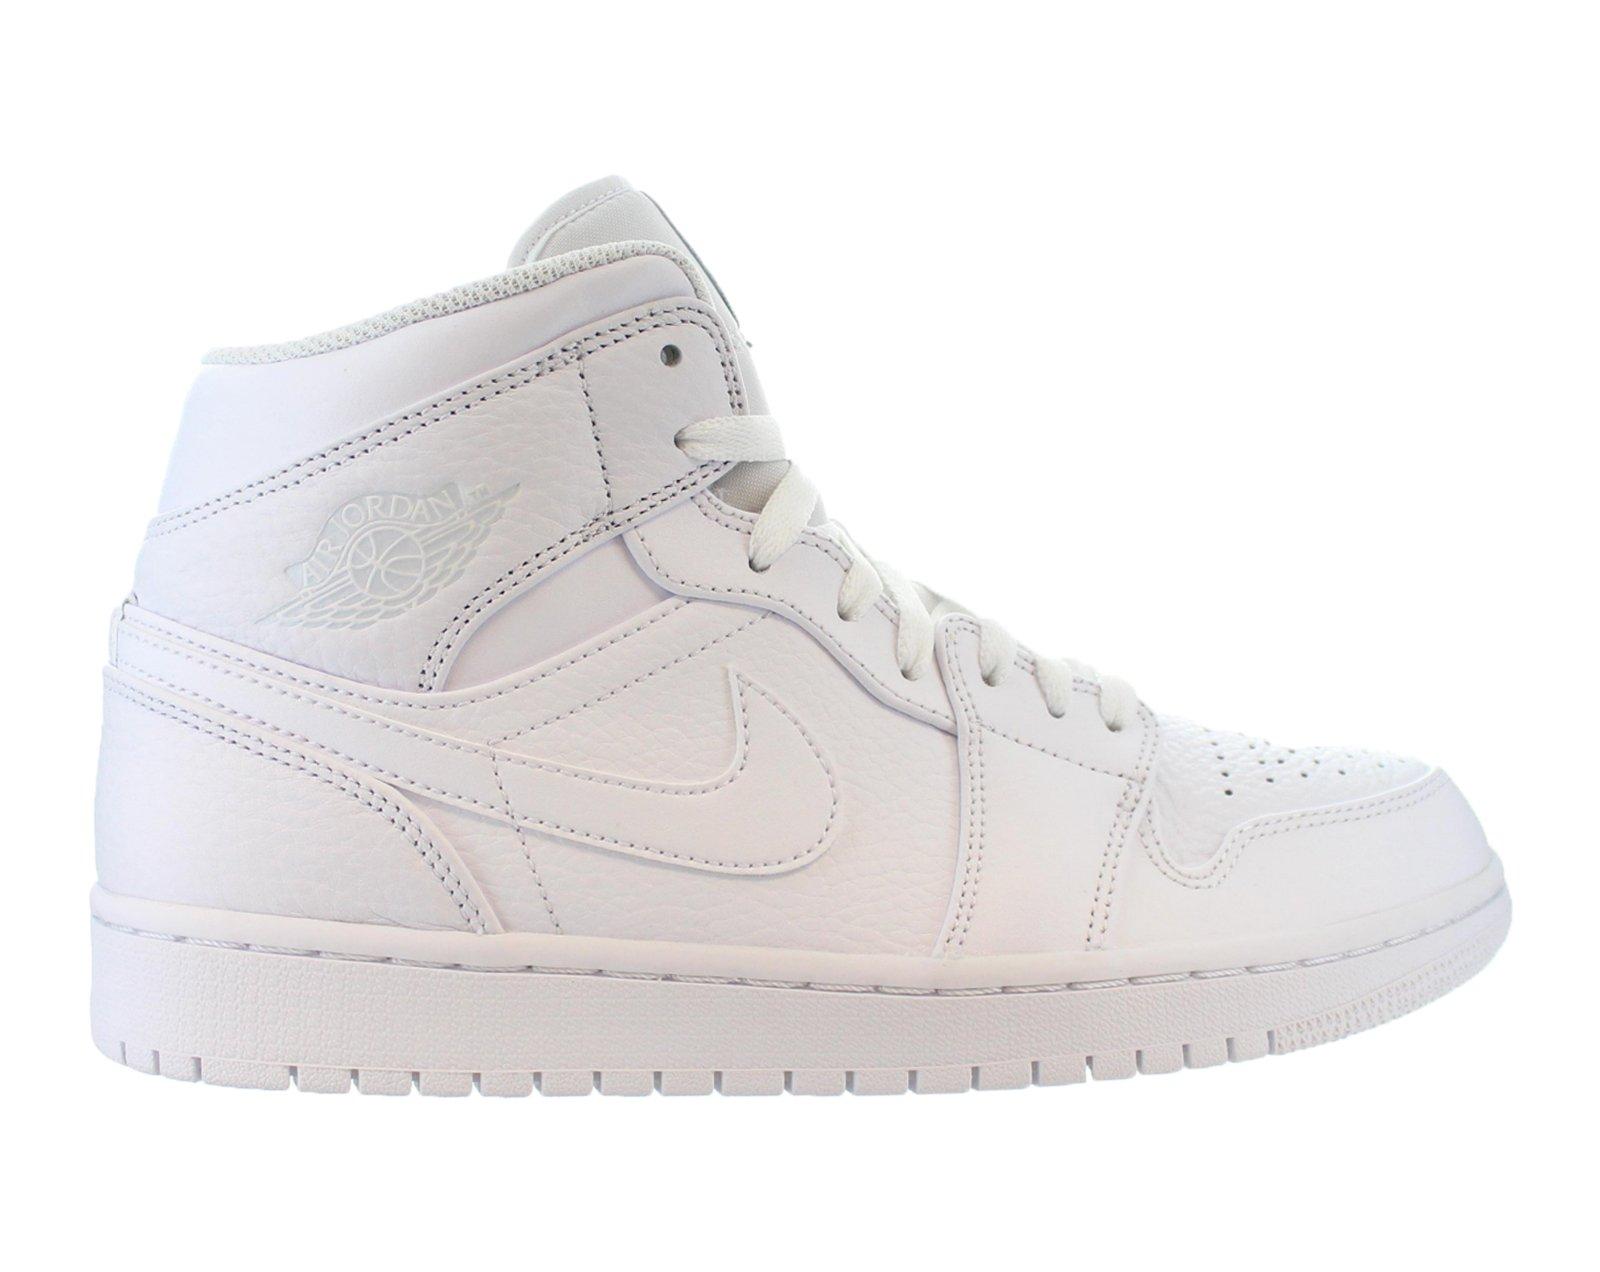 37769b9ca33b1b Air Jordan - Mens Air Jordan 1 Mid White Pure Platinum 554724-109 ...